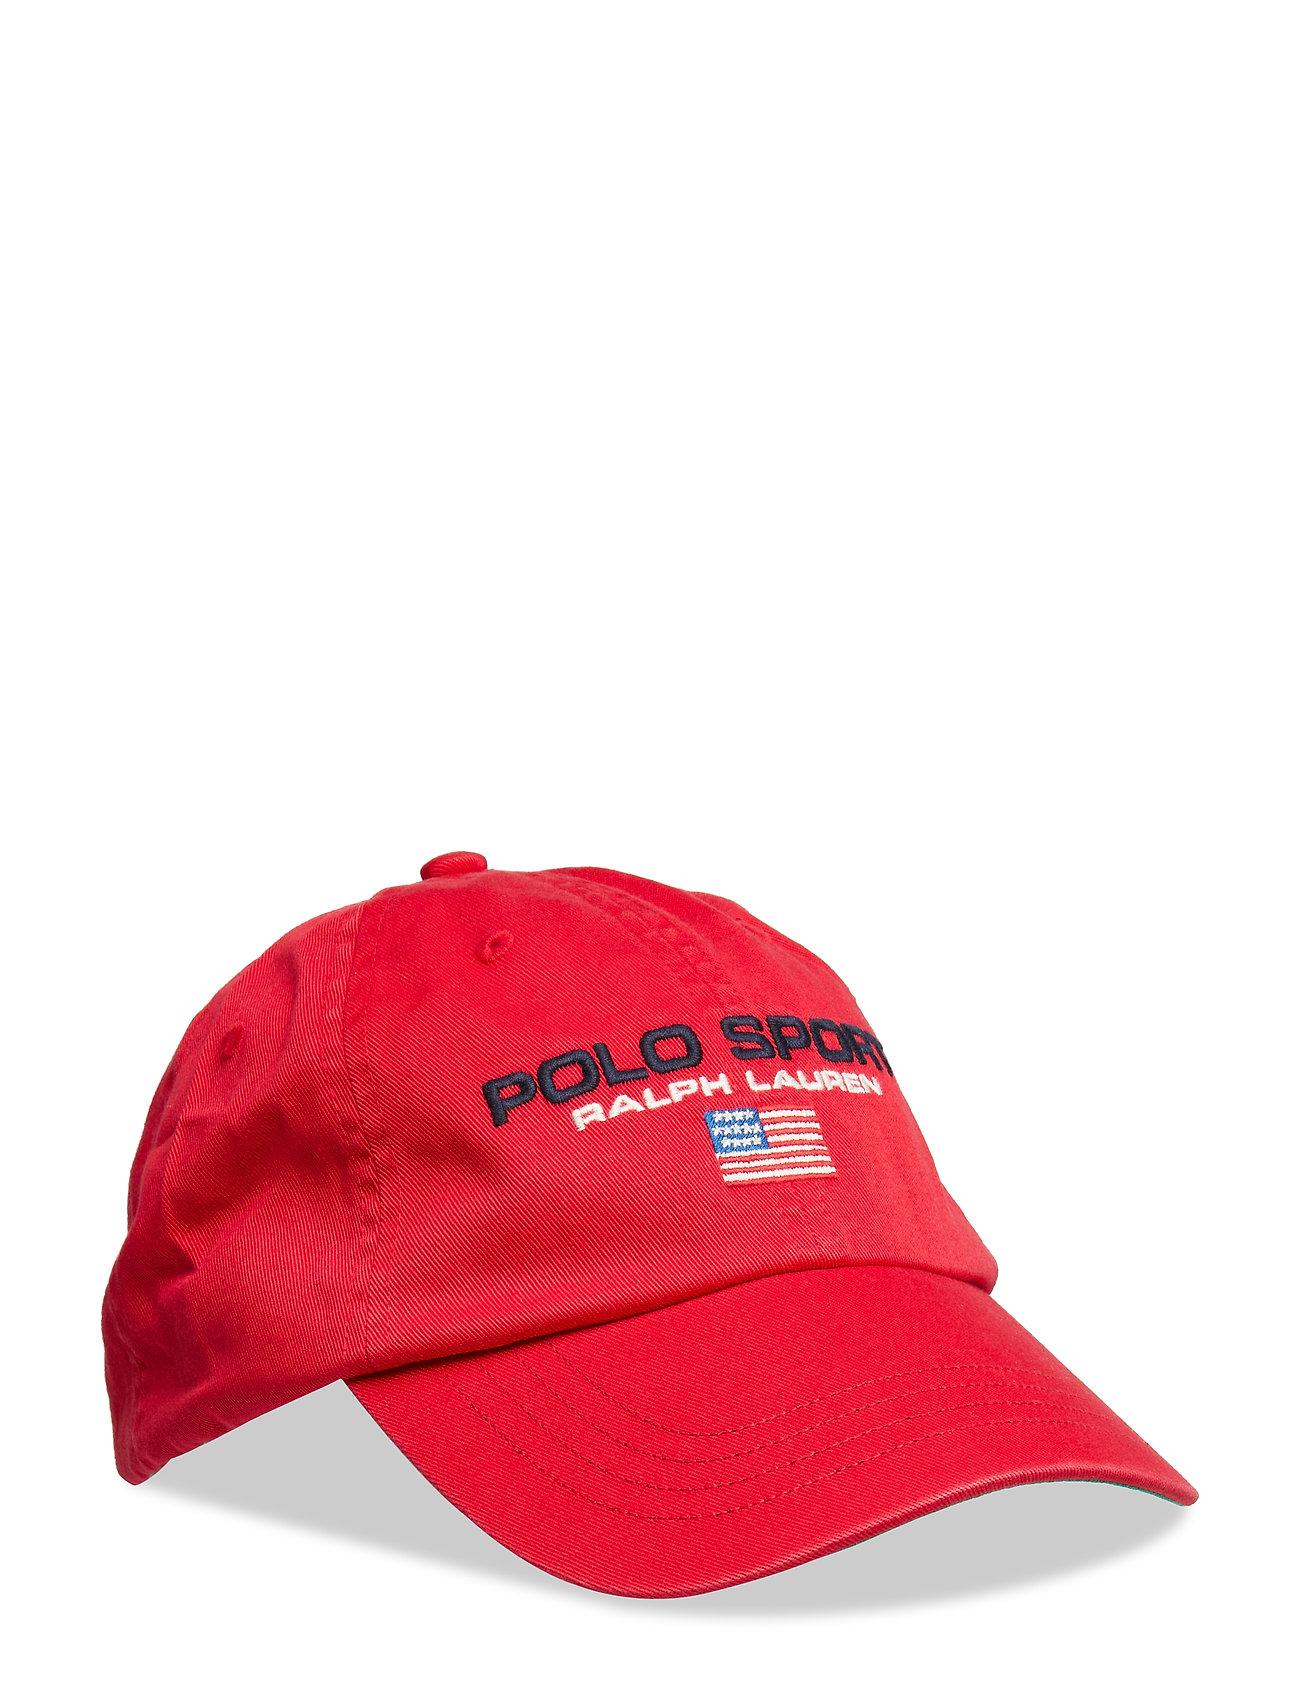 Polo Ralph Lauren Flag Cotton Chino Cap - RL 2000 RED W/ PO